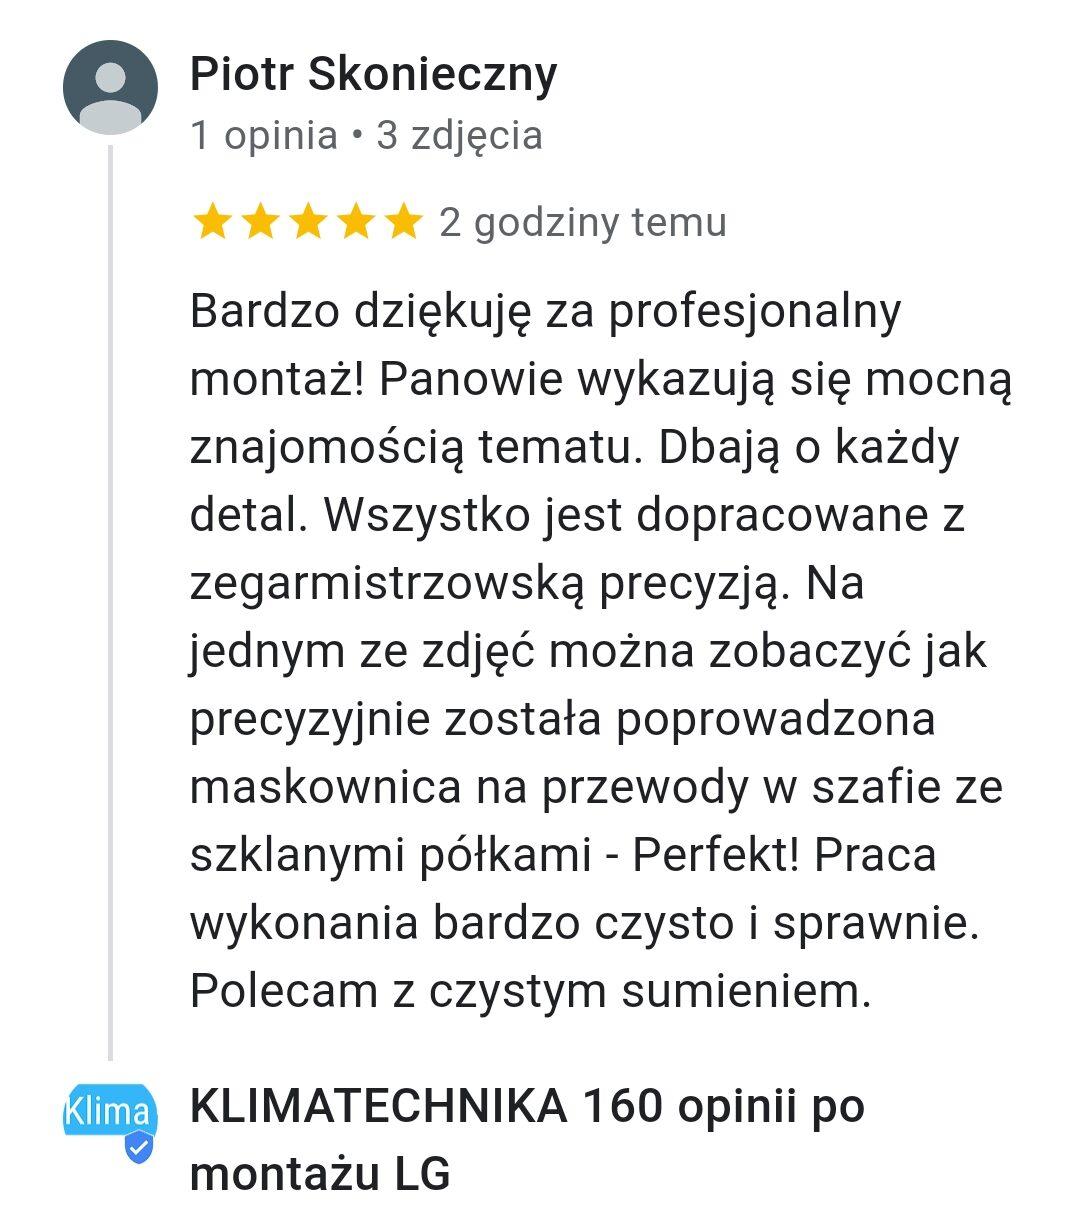 klimatechnika-opinia